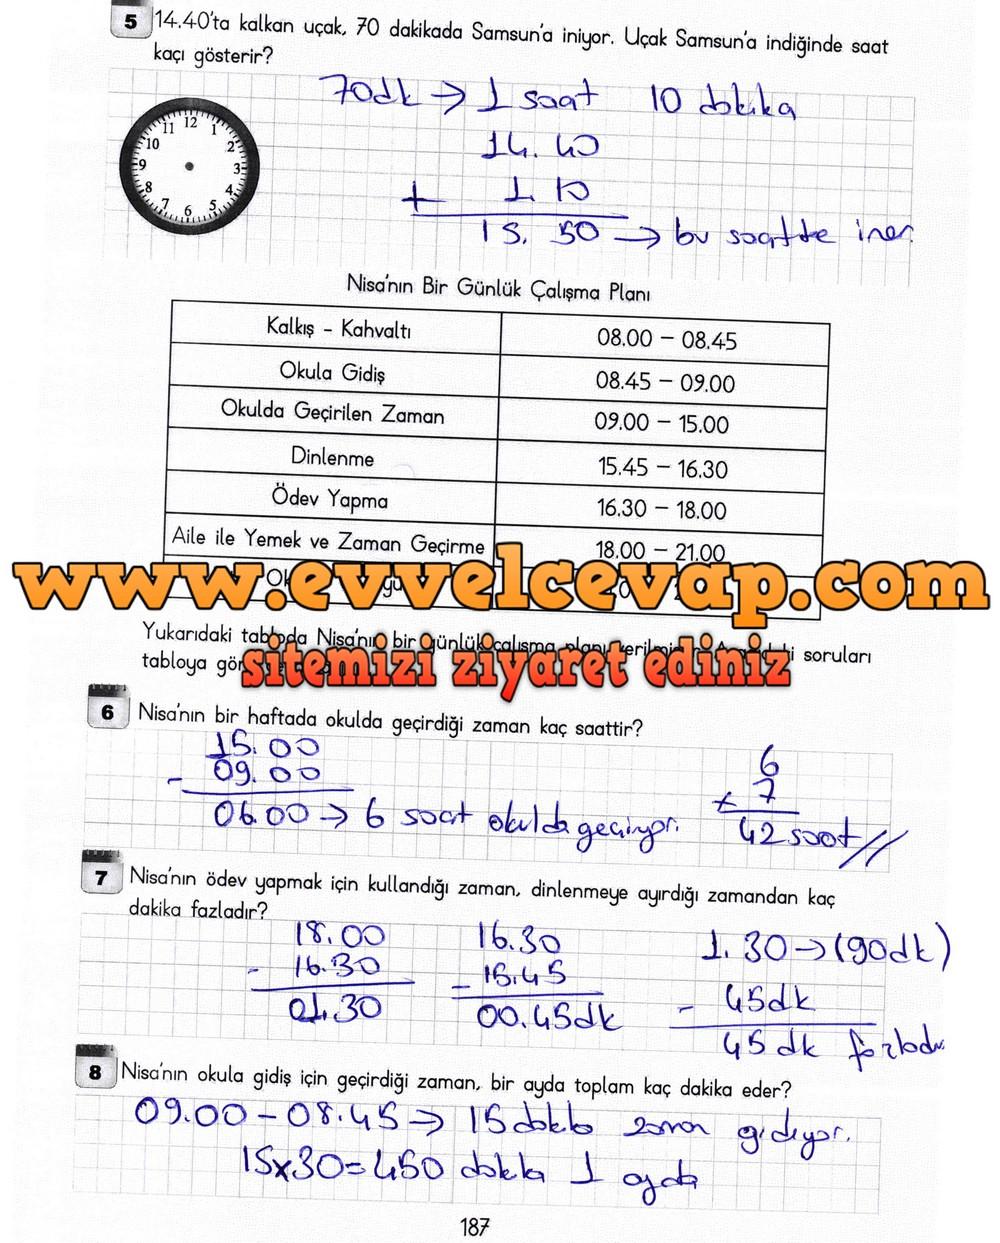 3 Sinif Matematik Meb Yayinlari Ders Kitabi Cevaplari Sayfa 187